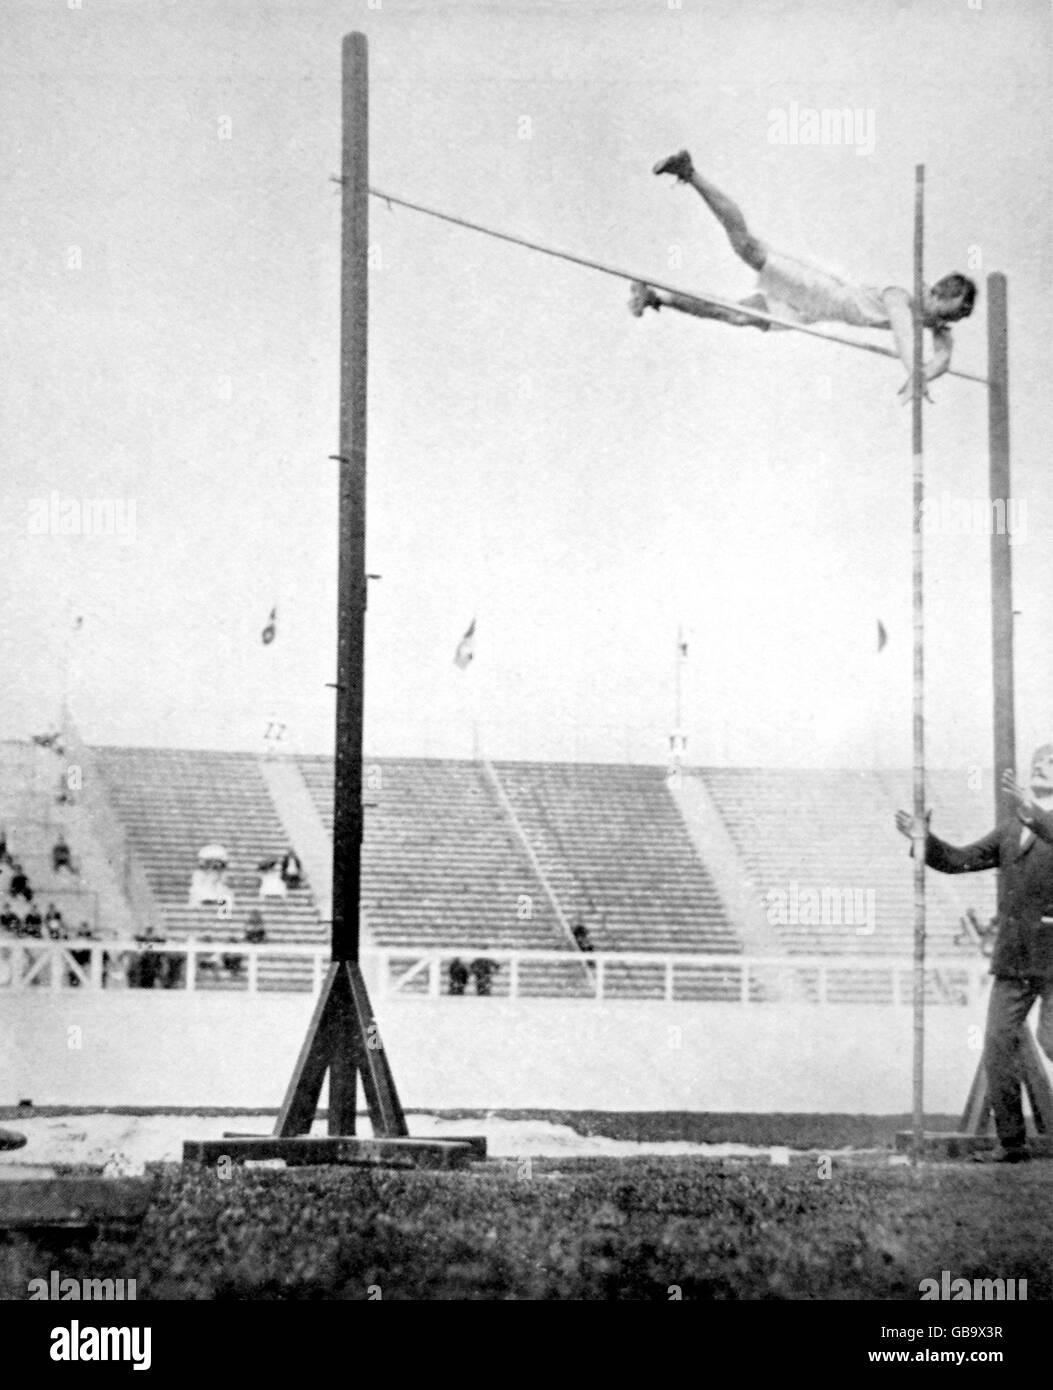 Athletics - London Olympic Games 1908 - Men's Pole Vault - Stock Image